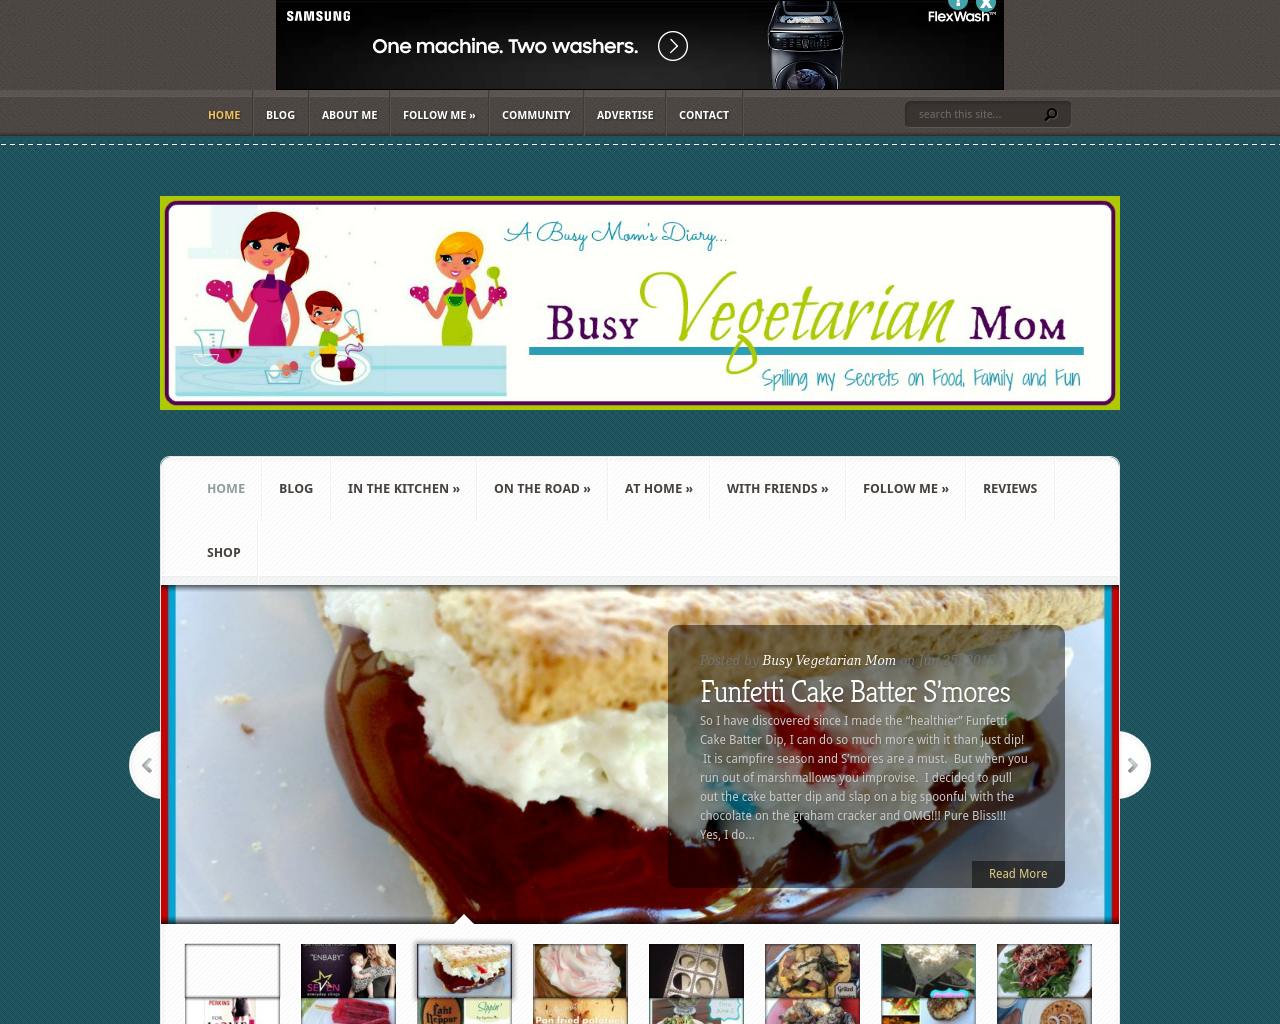 Busy-Vegetarian-Mom-Advertising-Reviews-Pricing